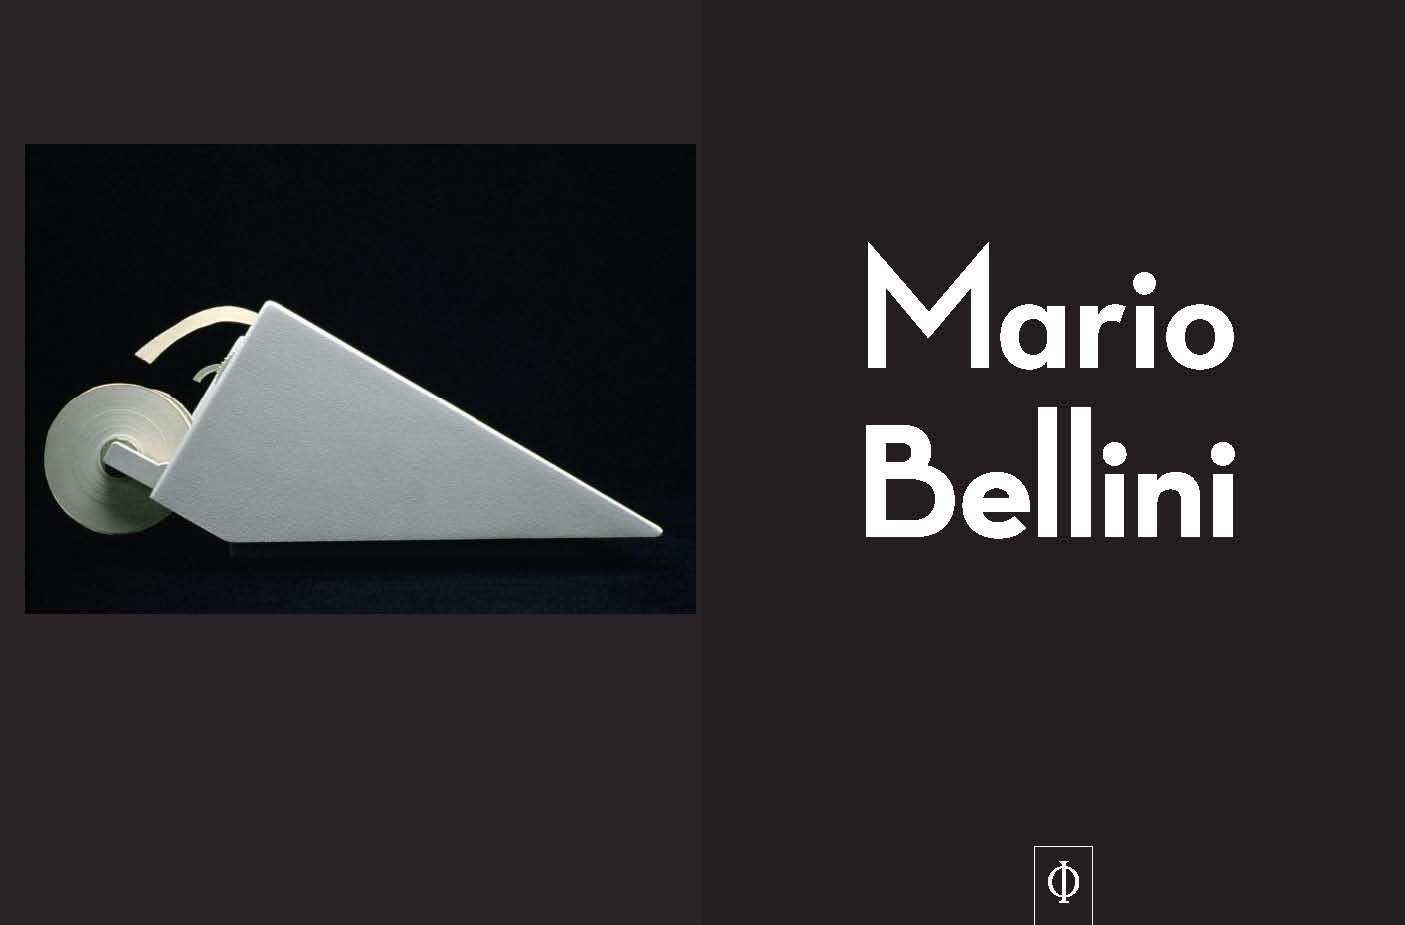 Mario Bellini Design.Mario Bellini Enrico Morteo 9780714869452 Amazon Com Books